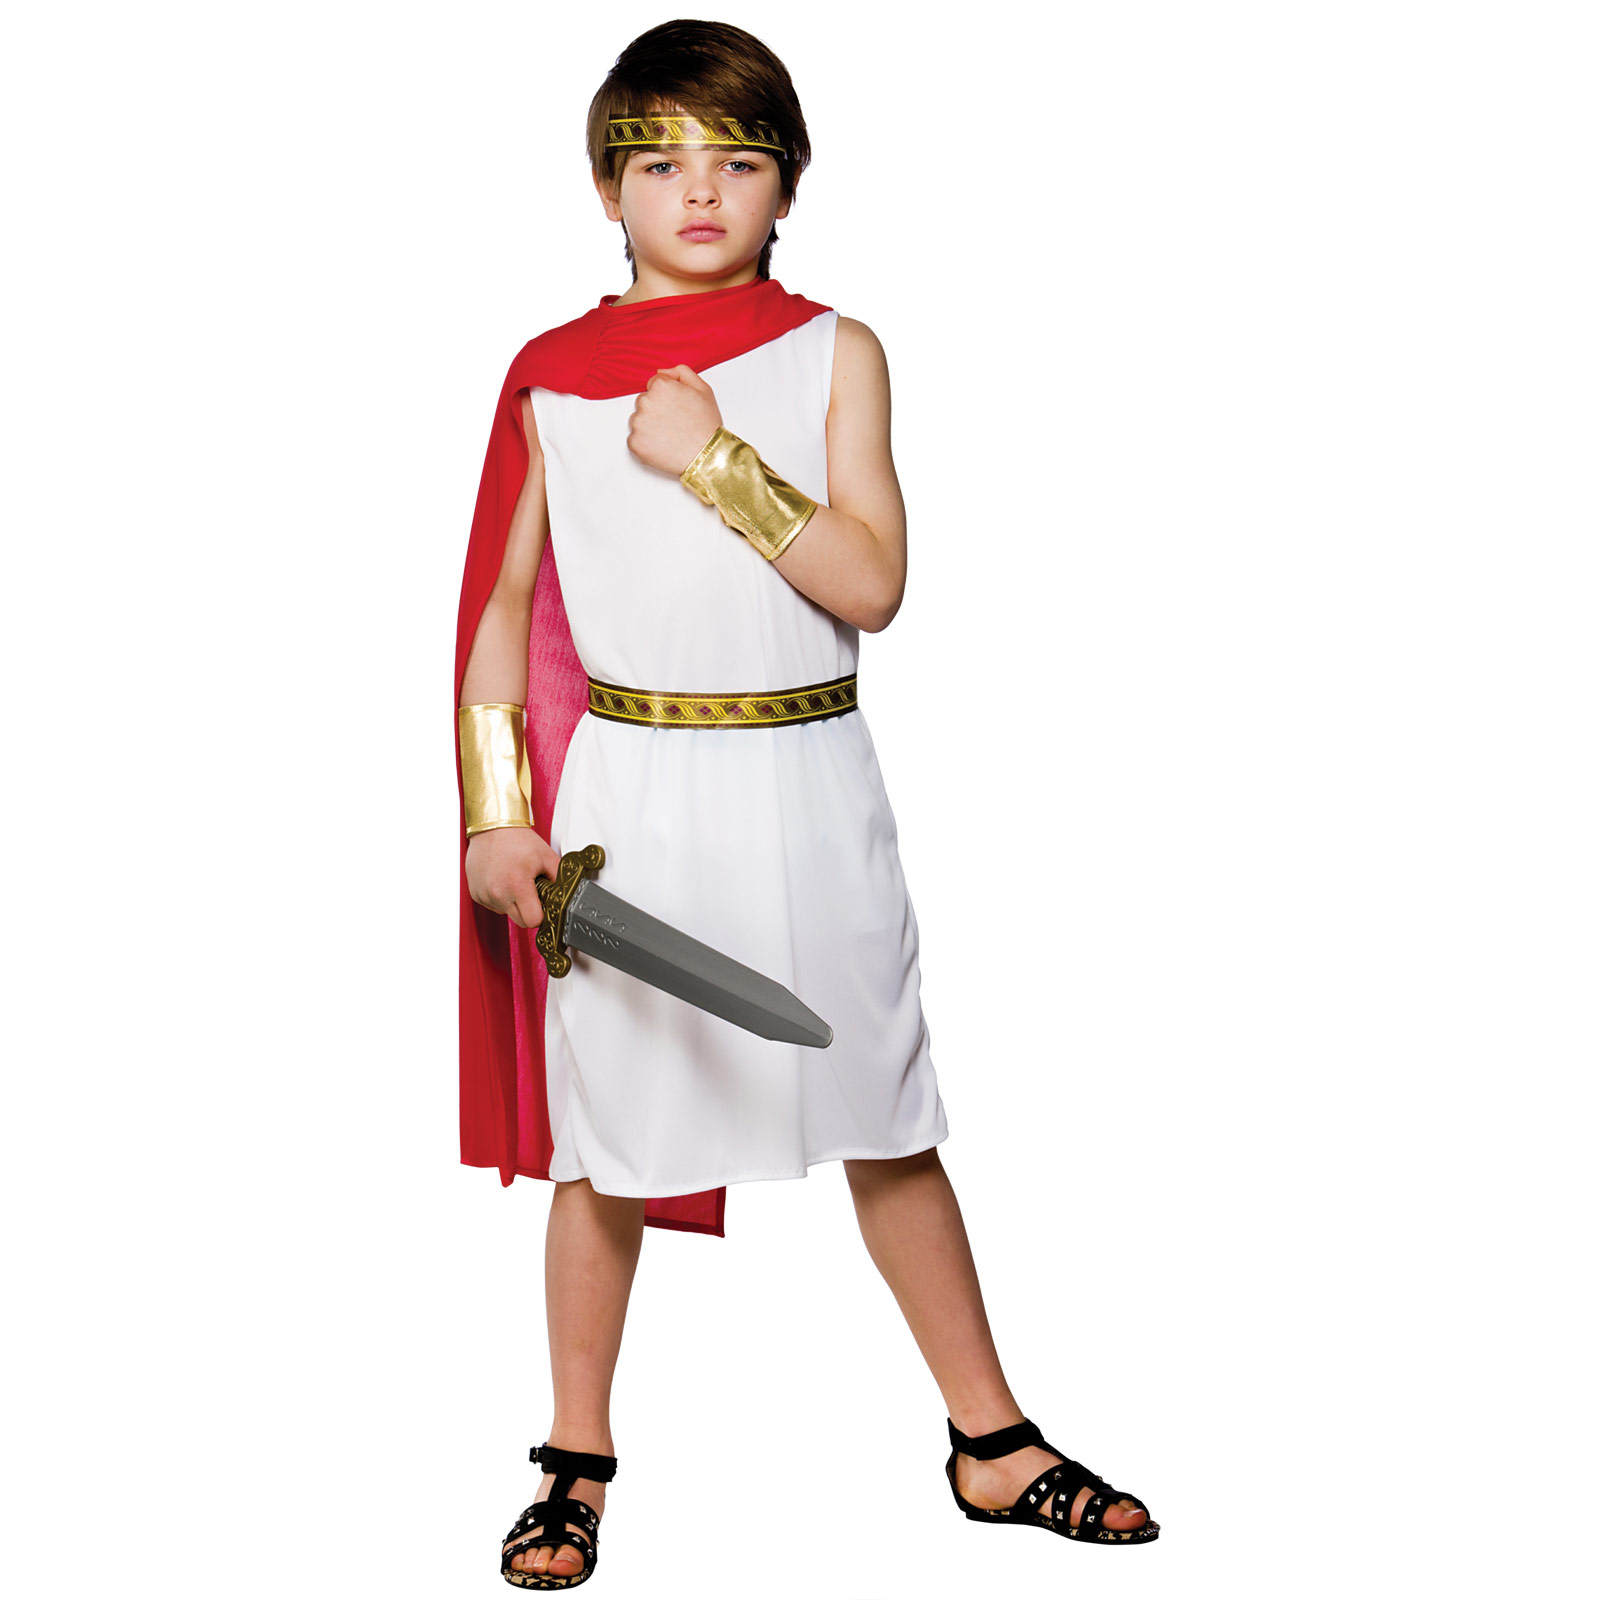 Boys Roman Boy Costume Fancy Dress Up Halloween Party Toga ...